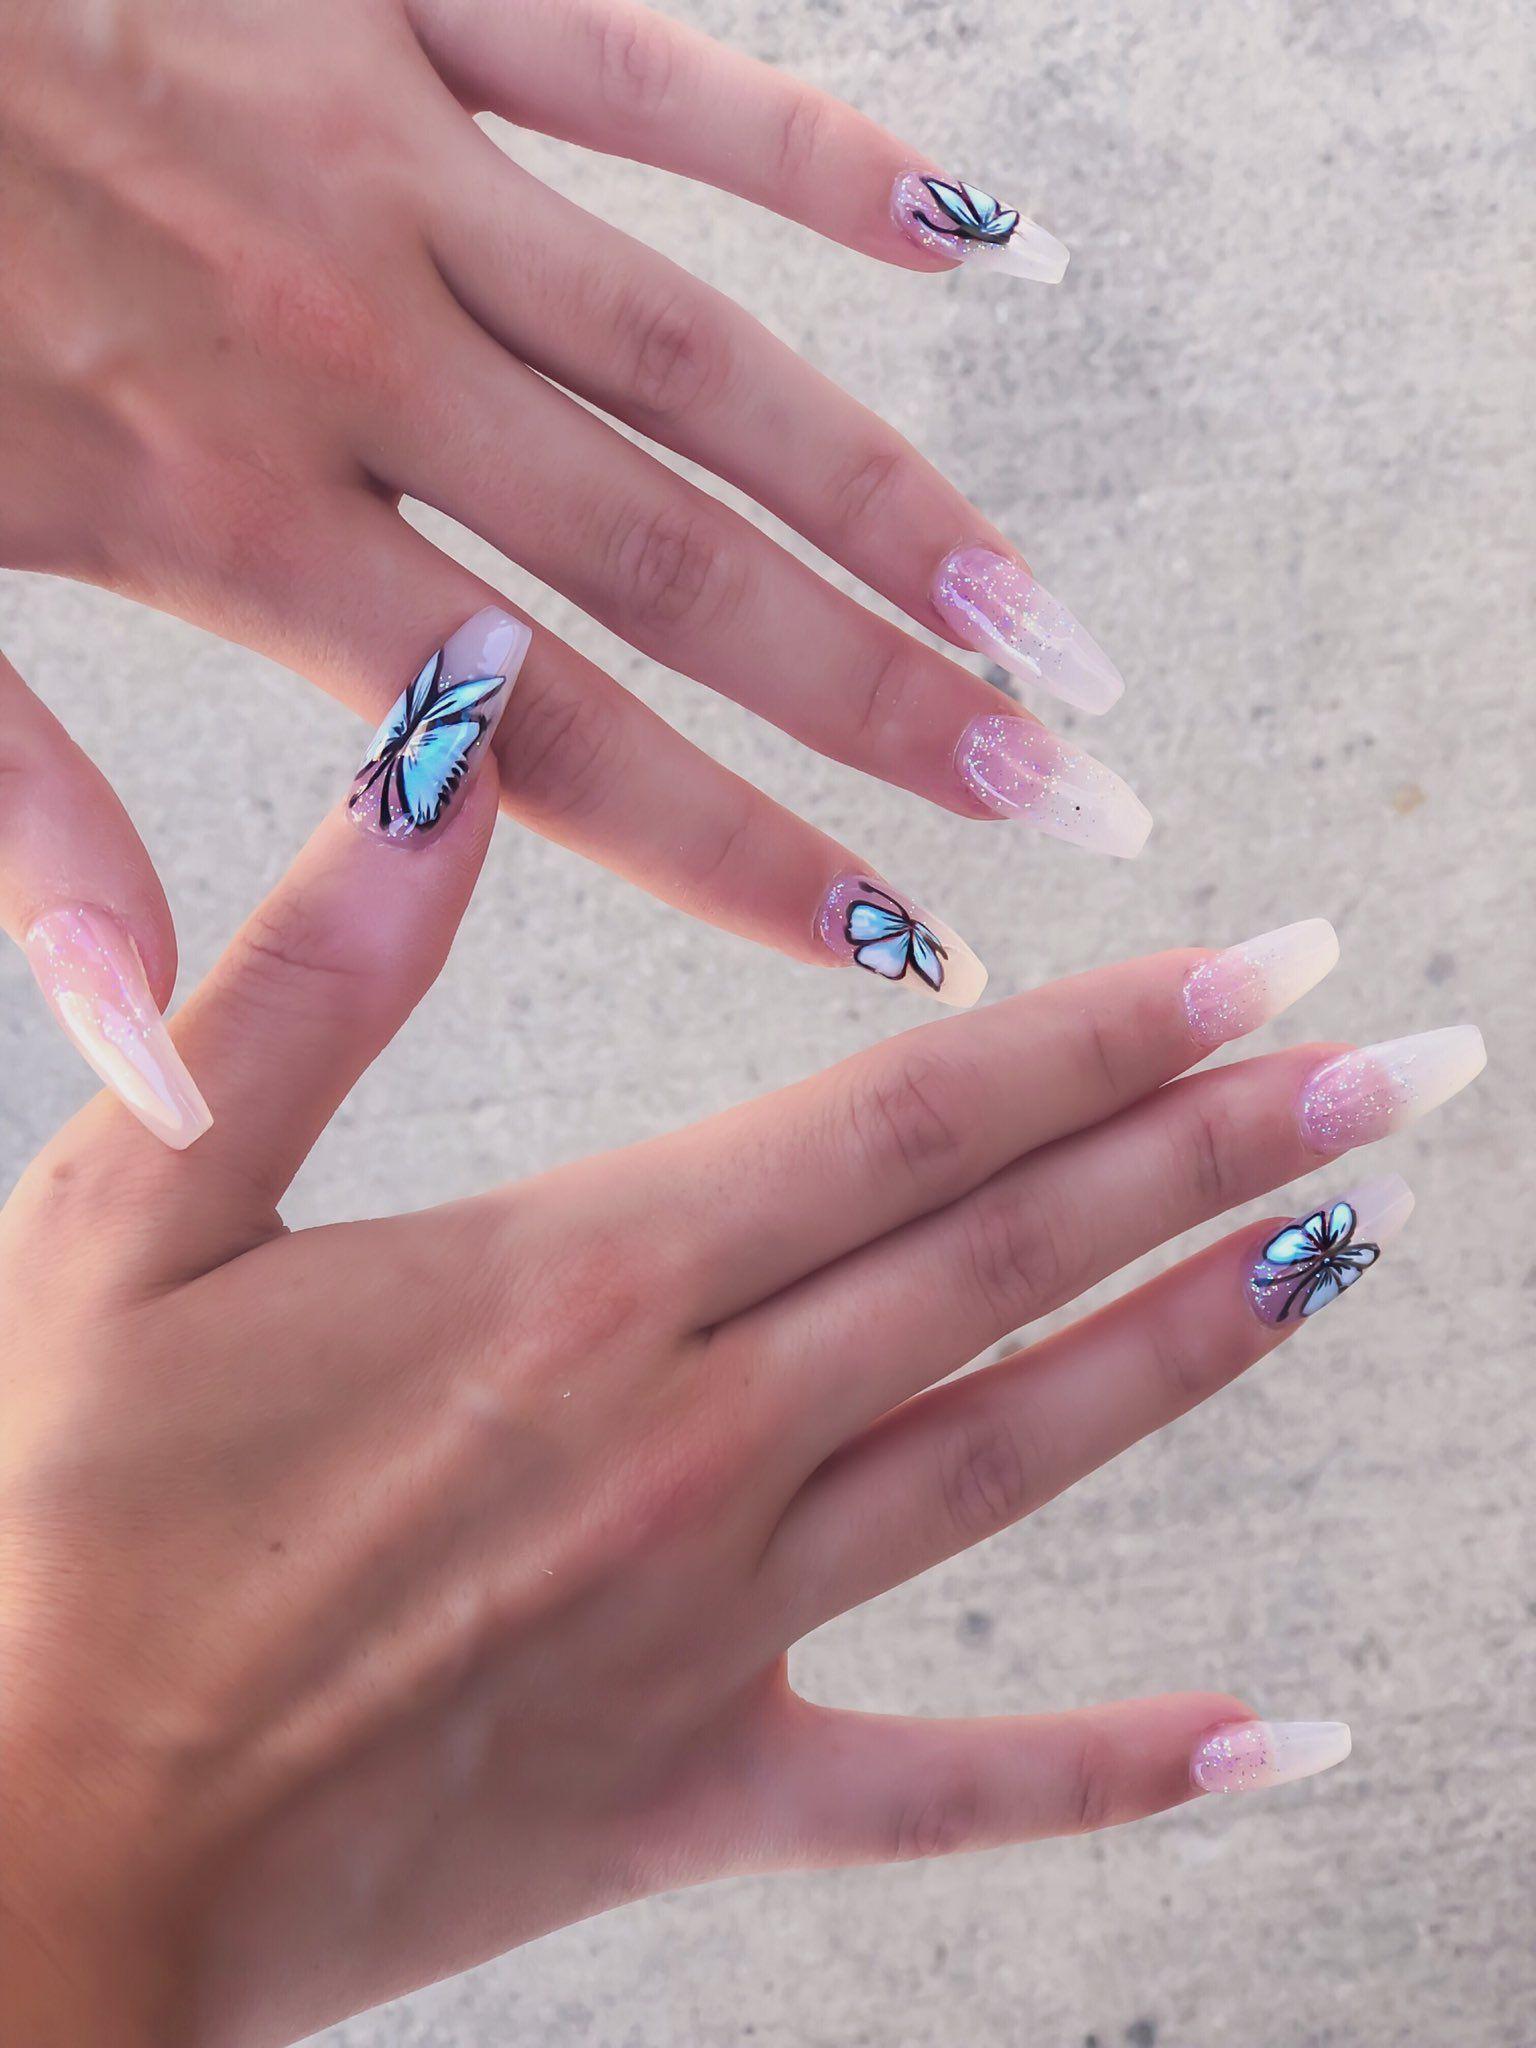 Cute acrylic nails